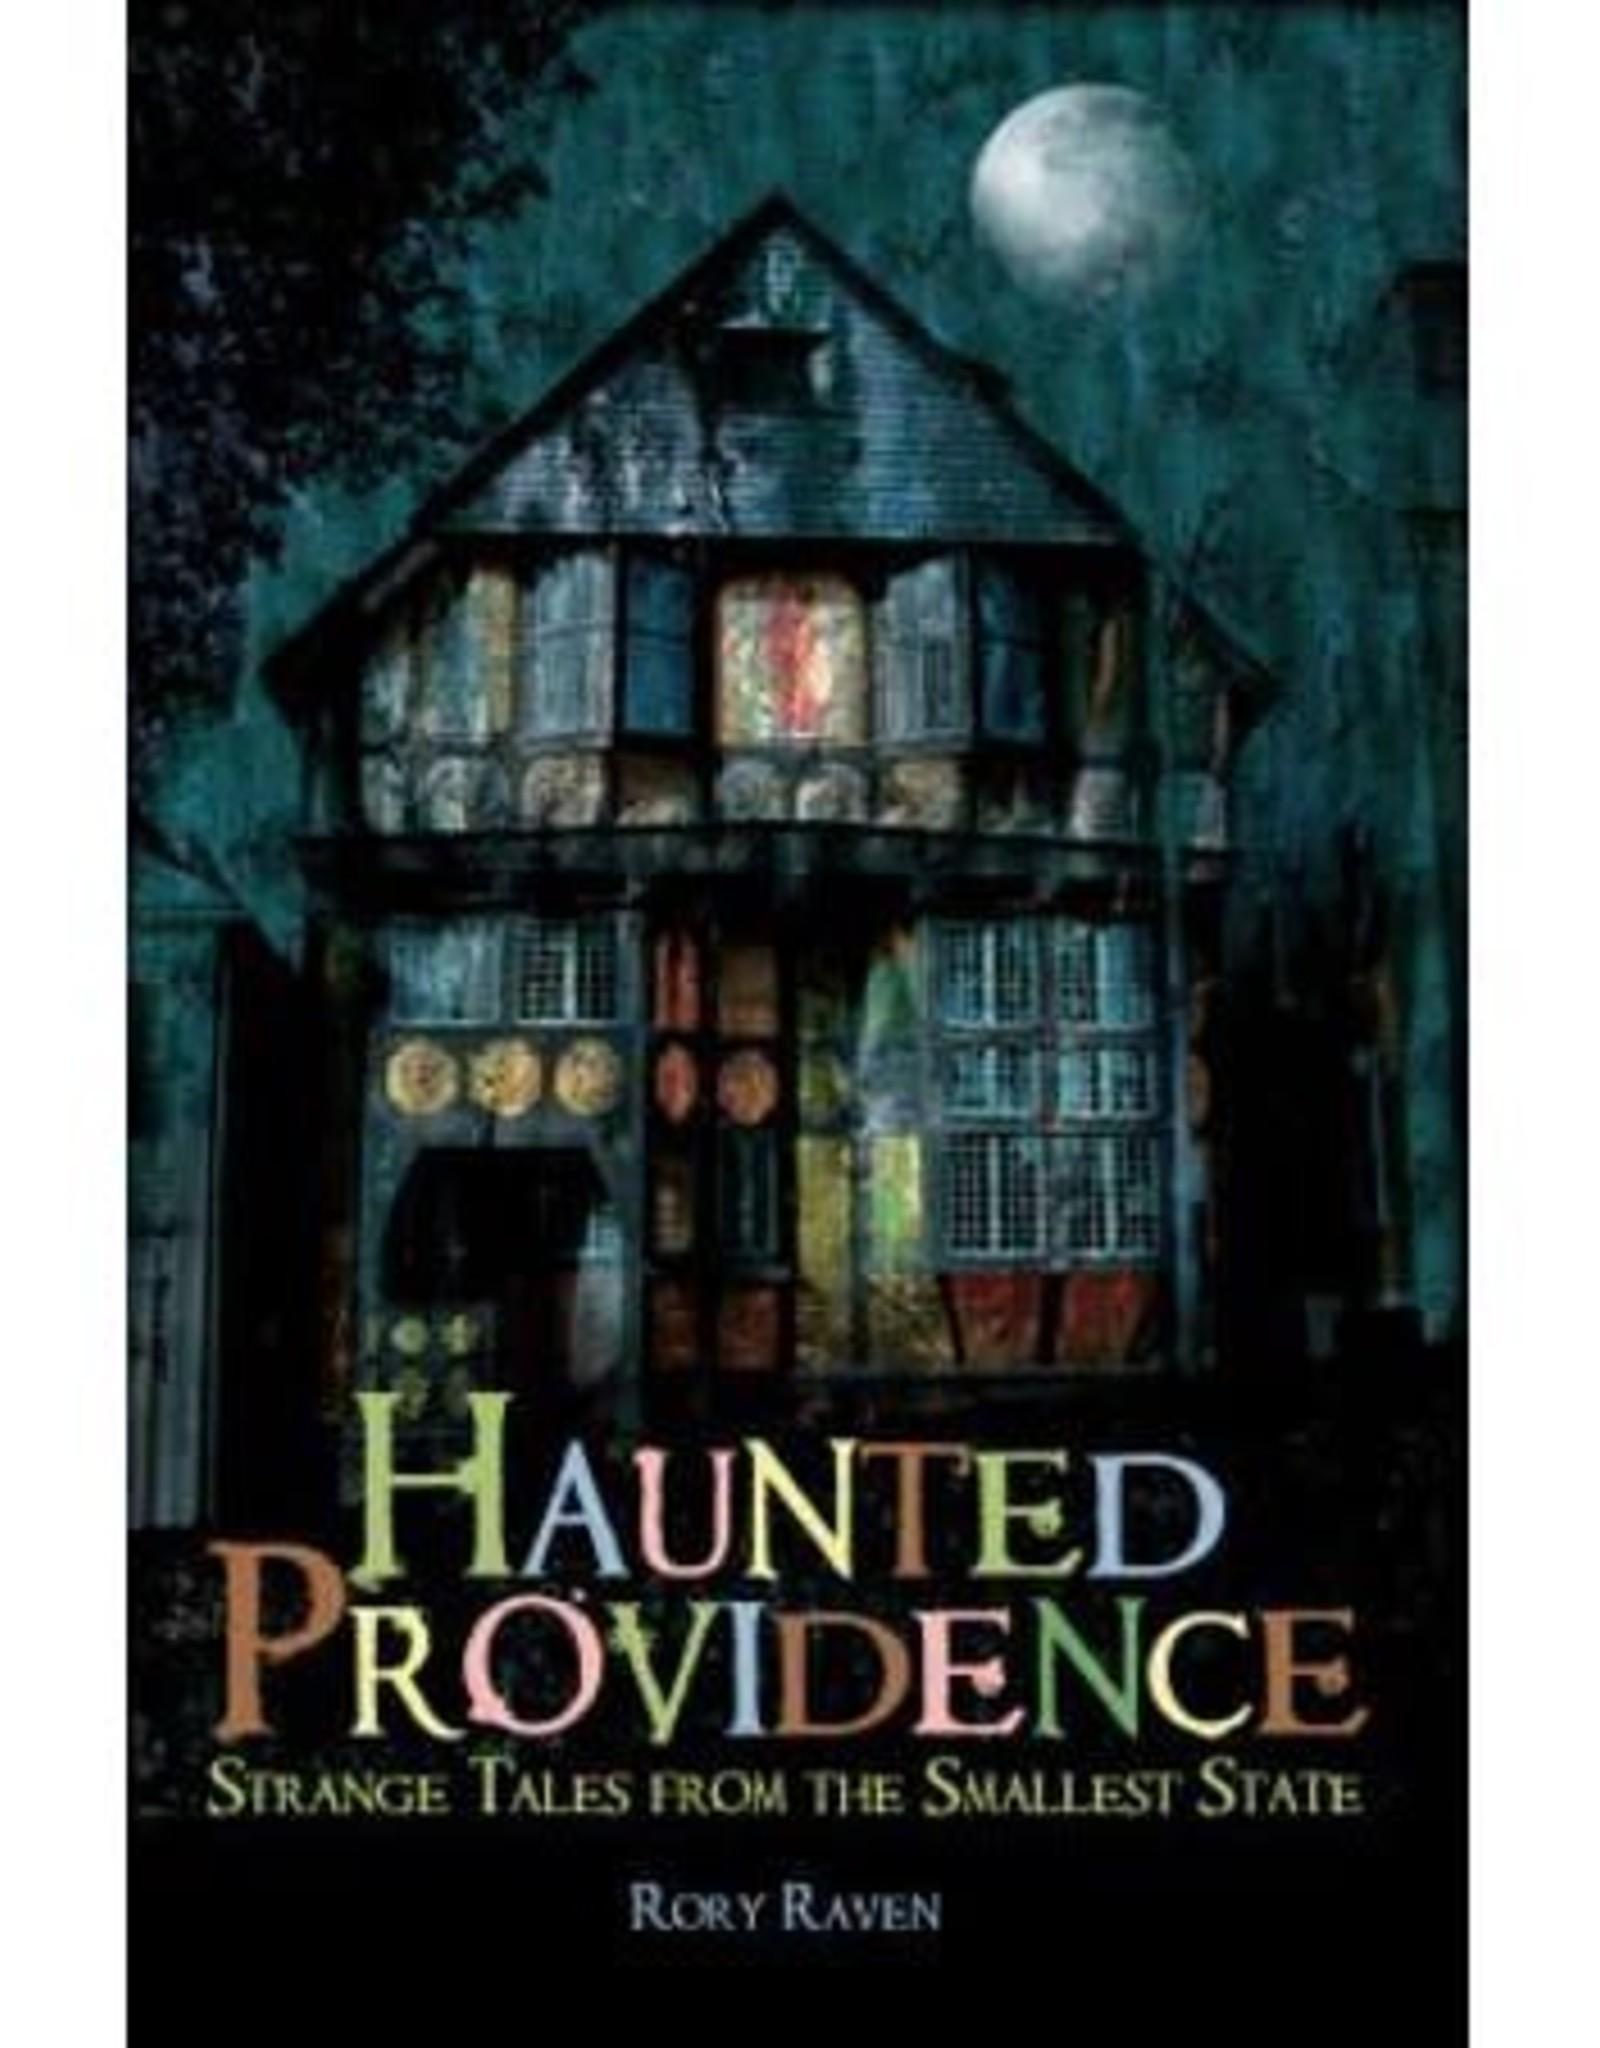 Haunted Providence